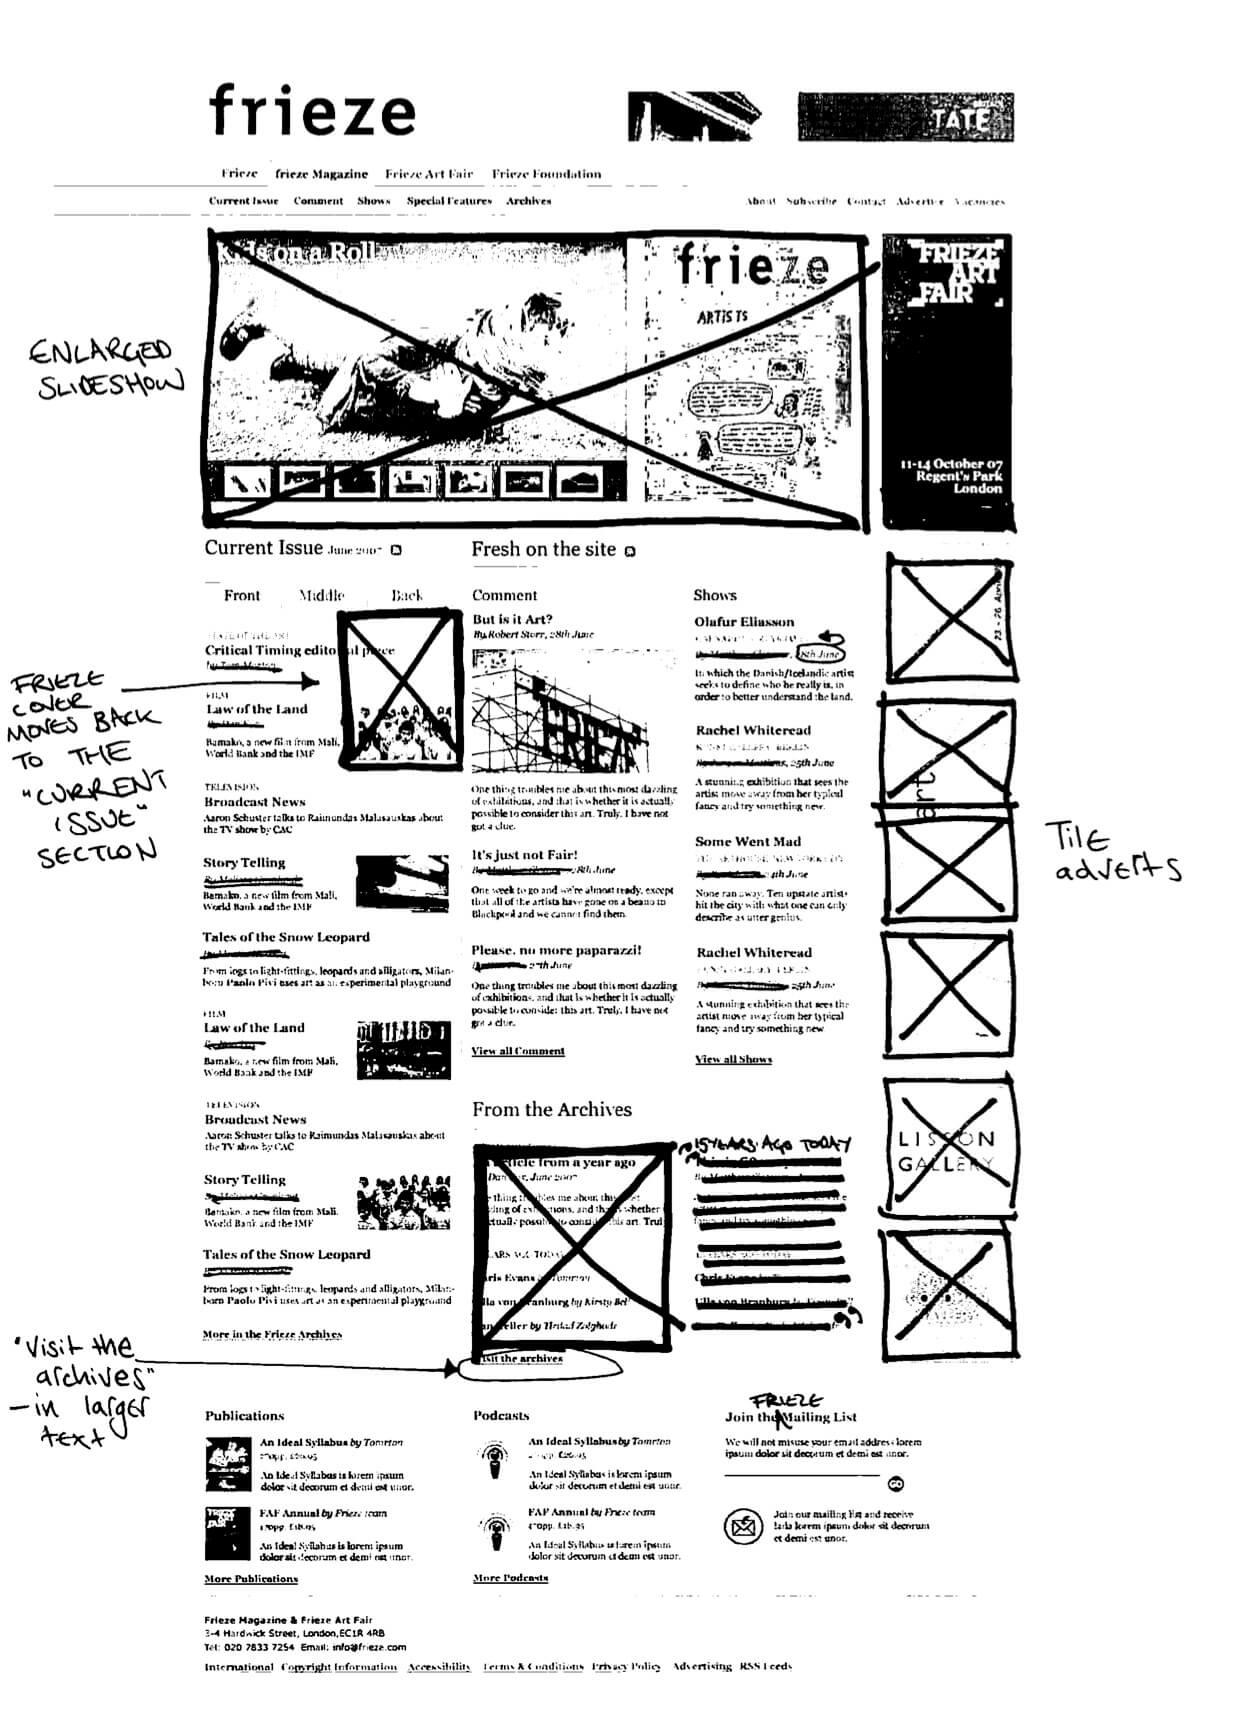 Collaborative sketch for Frieze magazine website